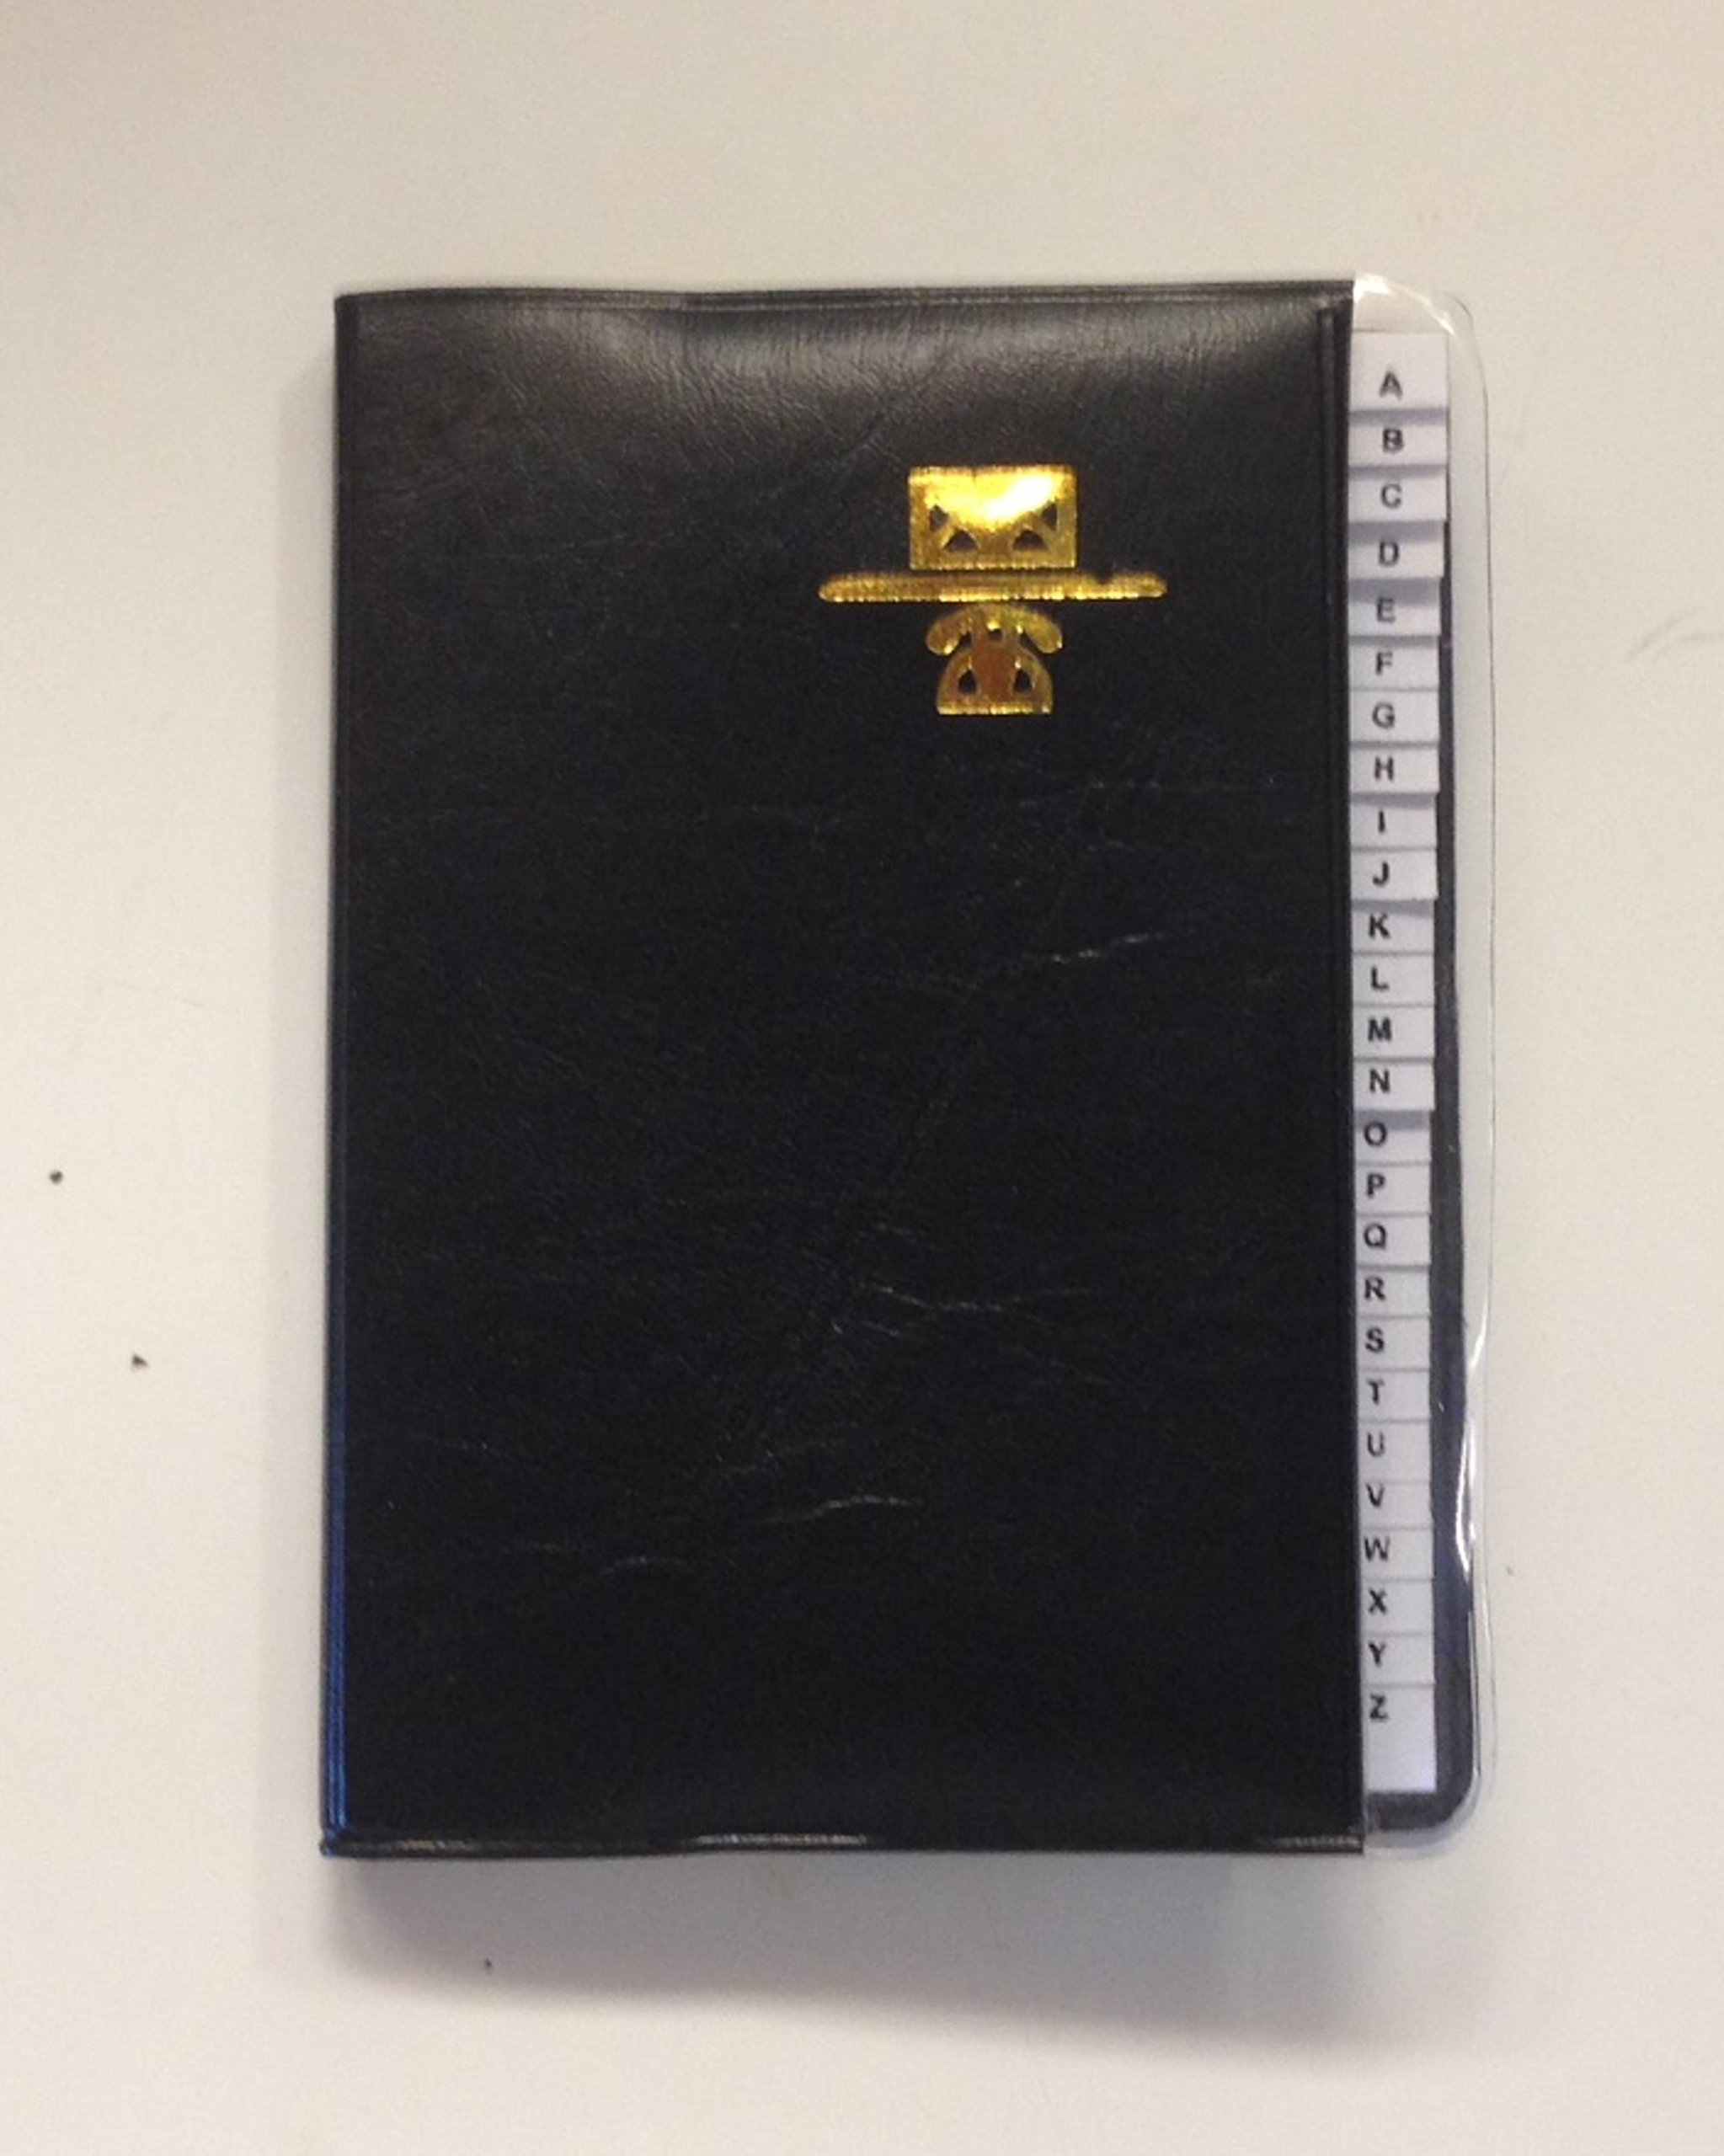 Kamset Address Telephone Book Small 3.25'' x 4'' Black